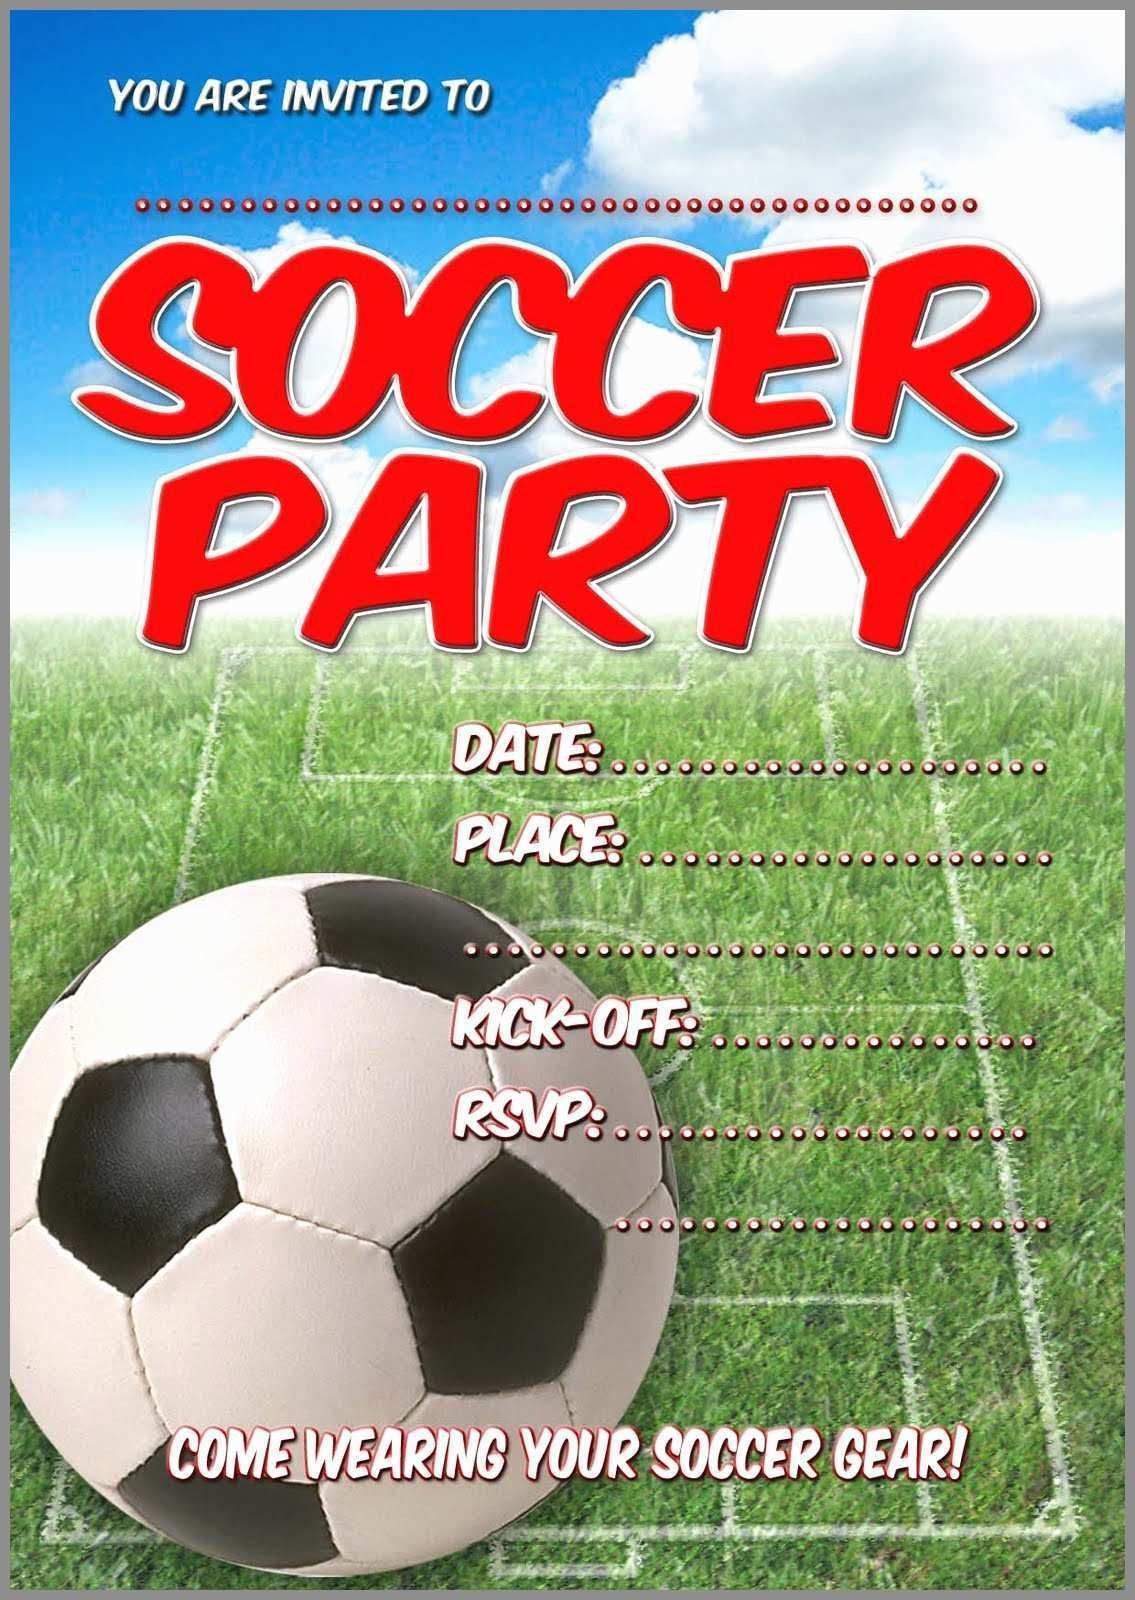 98+ Printable Birthday Cards Soccer - Free Printable Birthday Party - Free Printable Soccer Birthday Invitations